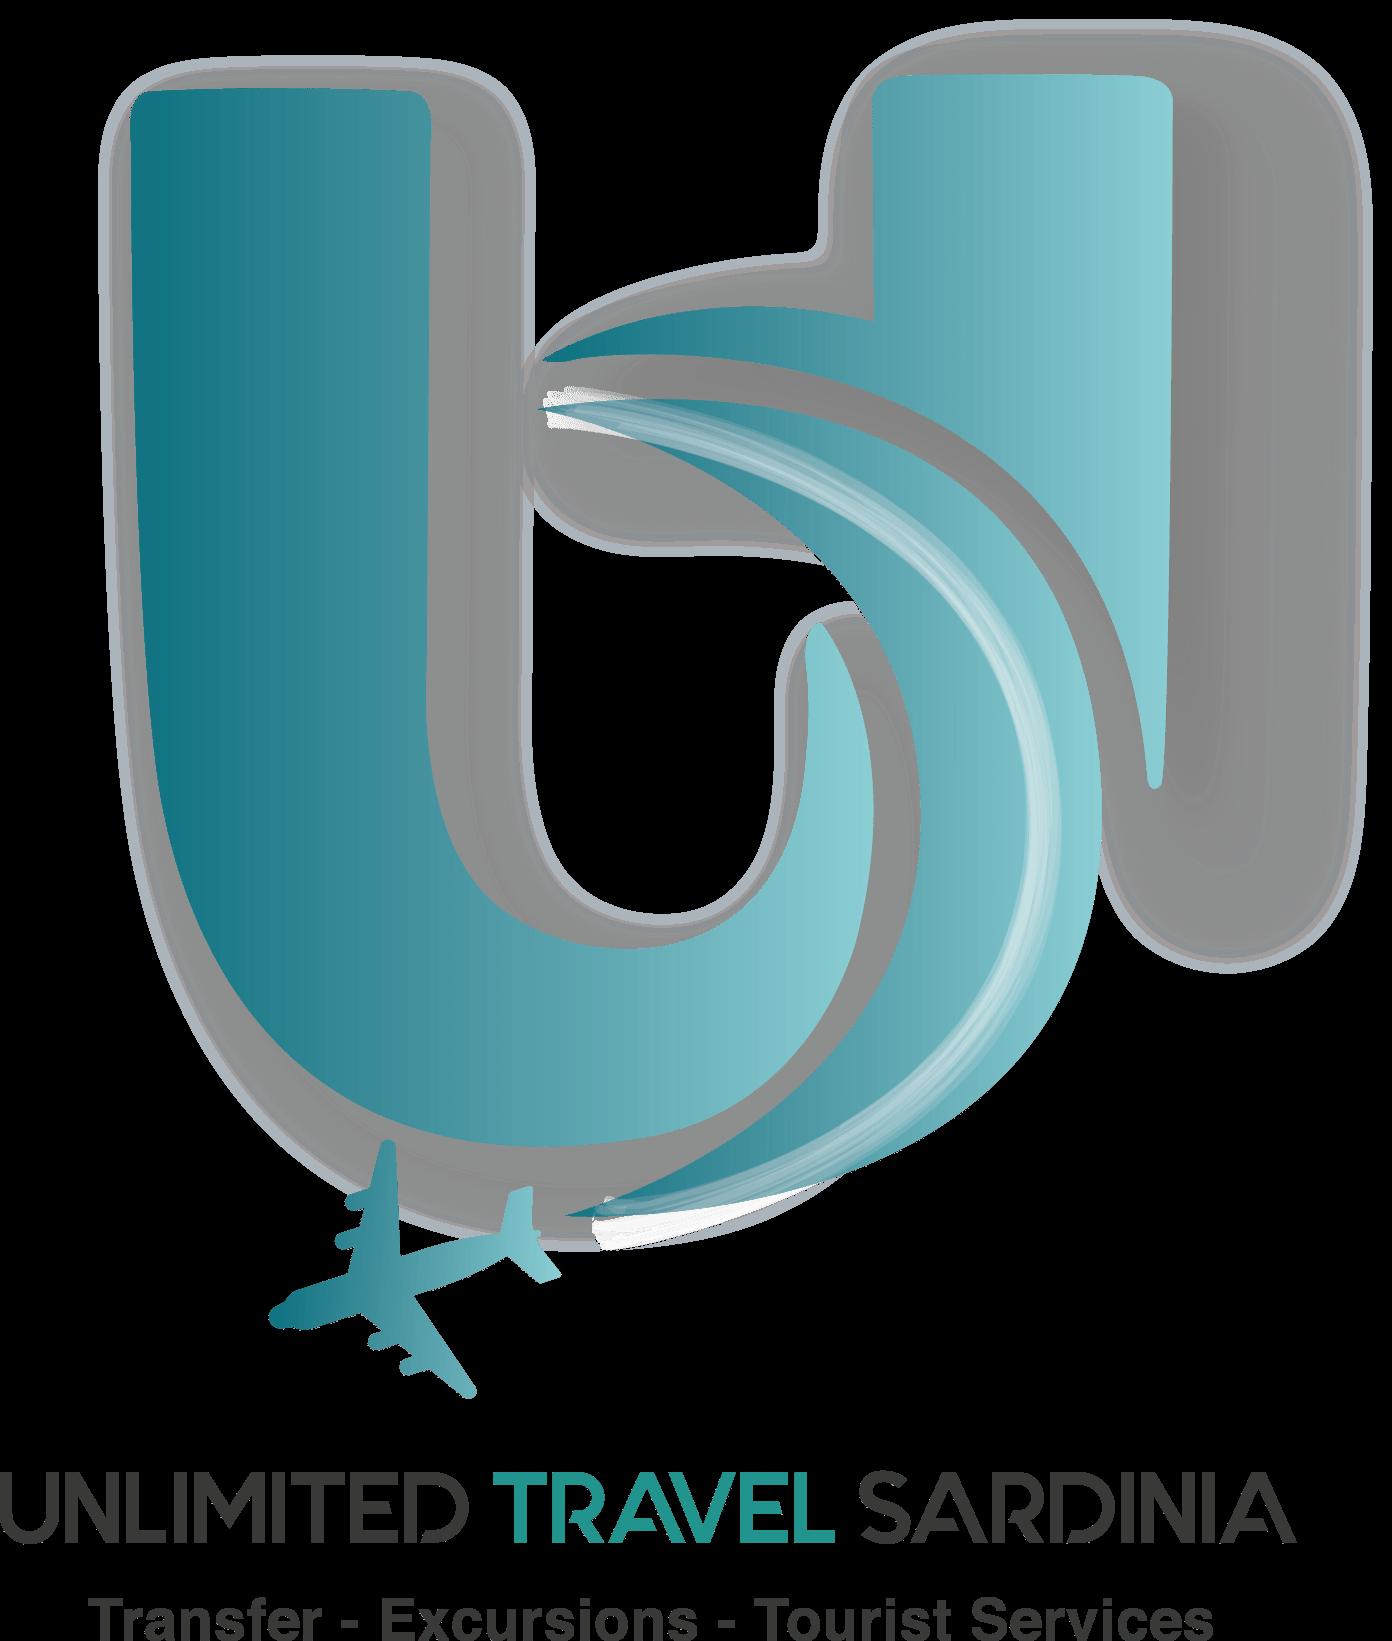 Unlimited Travel Sardinia